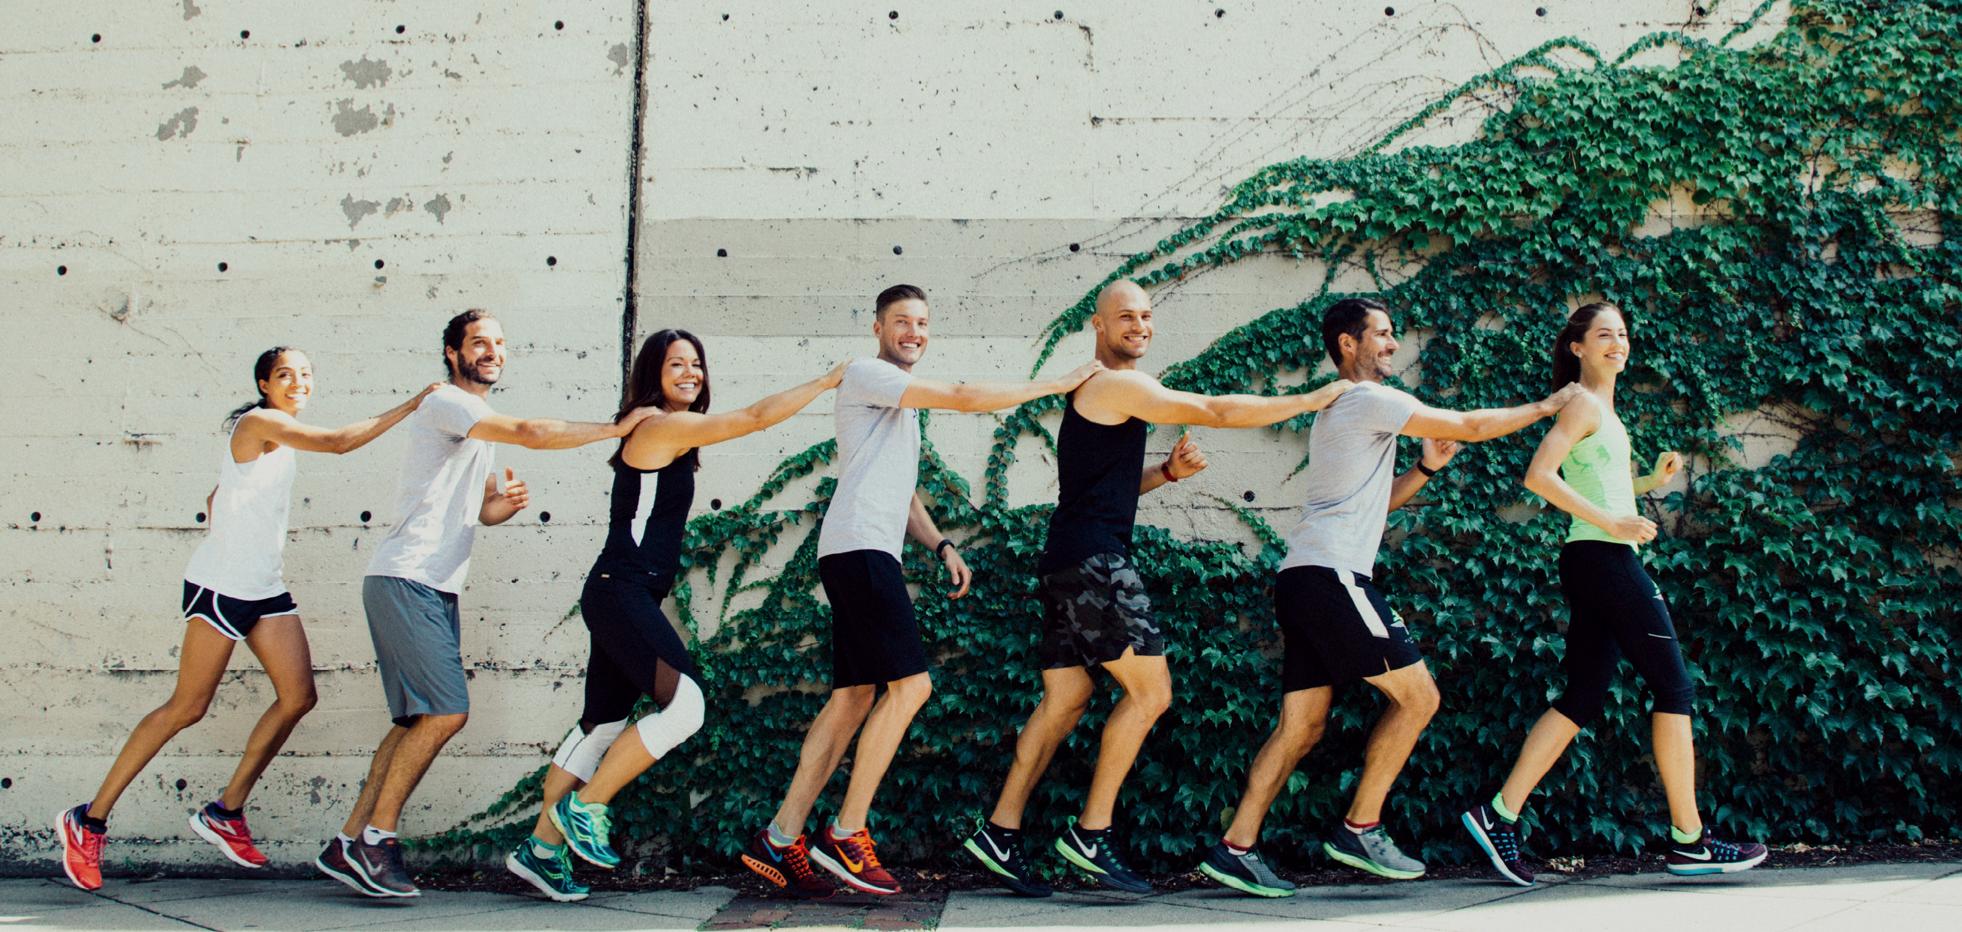 Fly Feet Running - Team Building Events